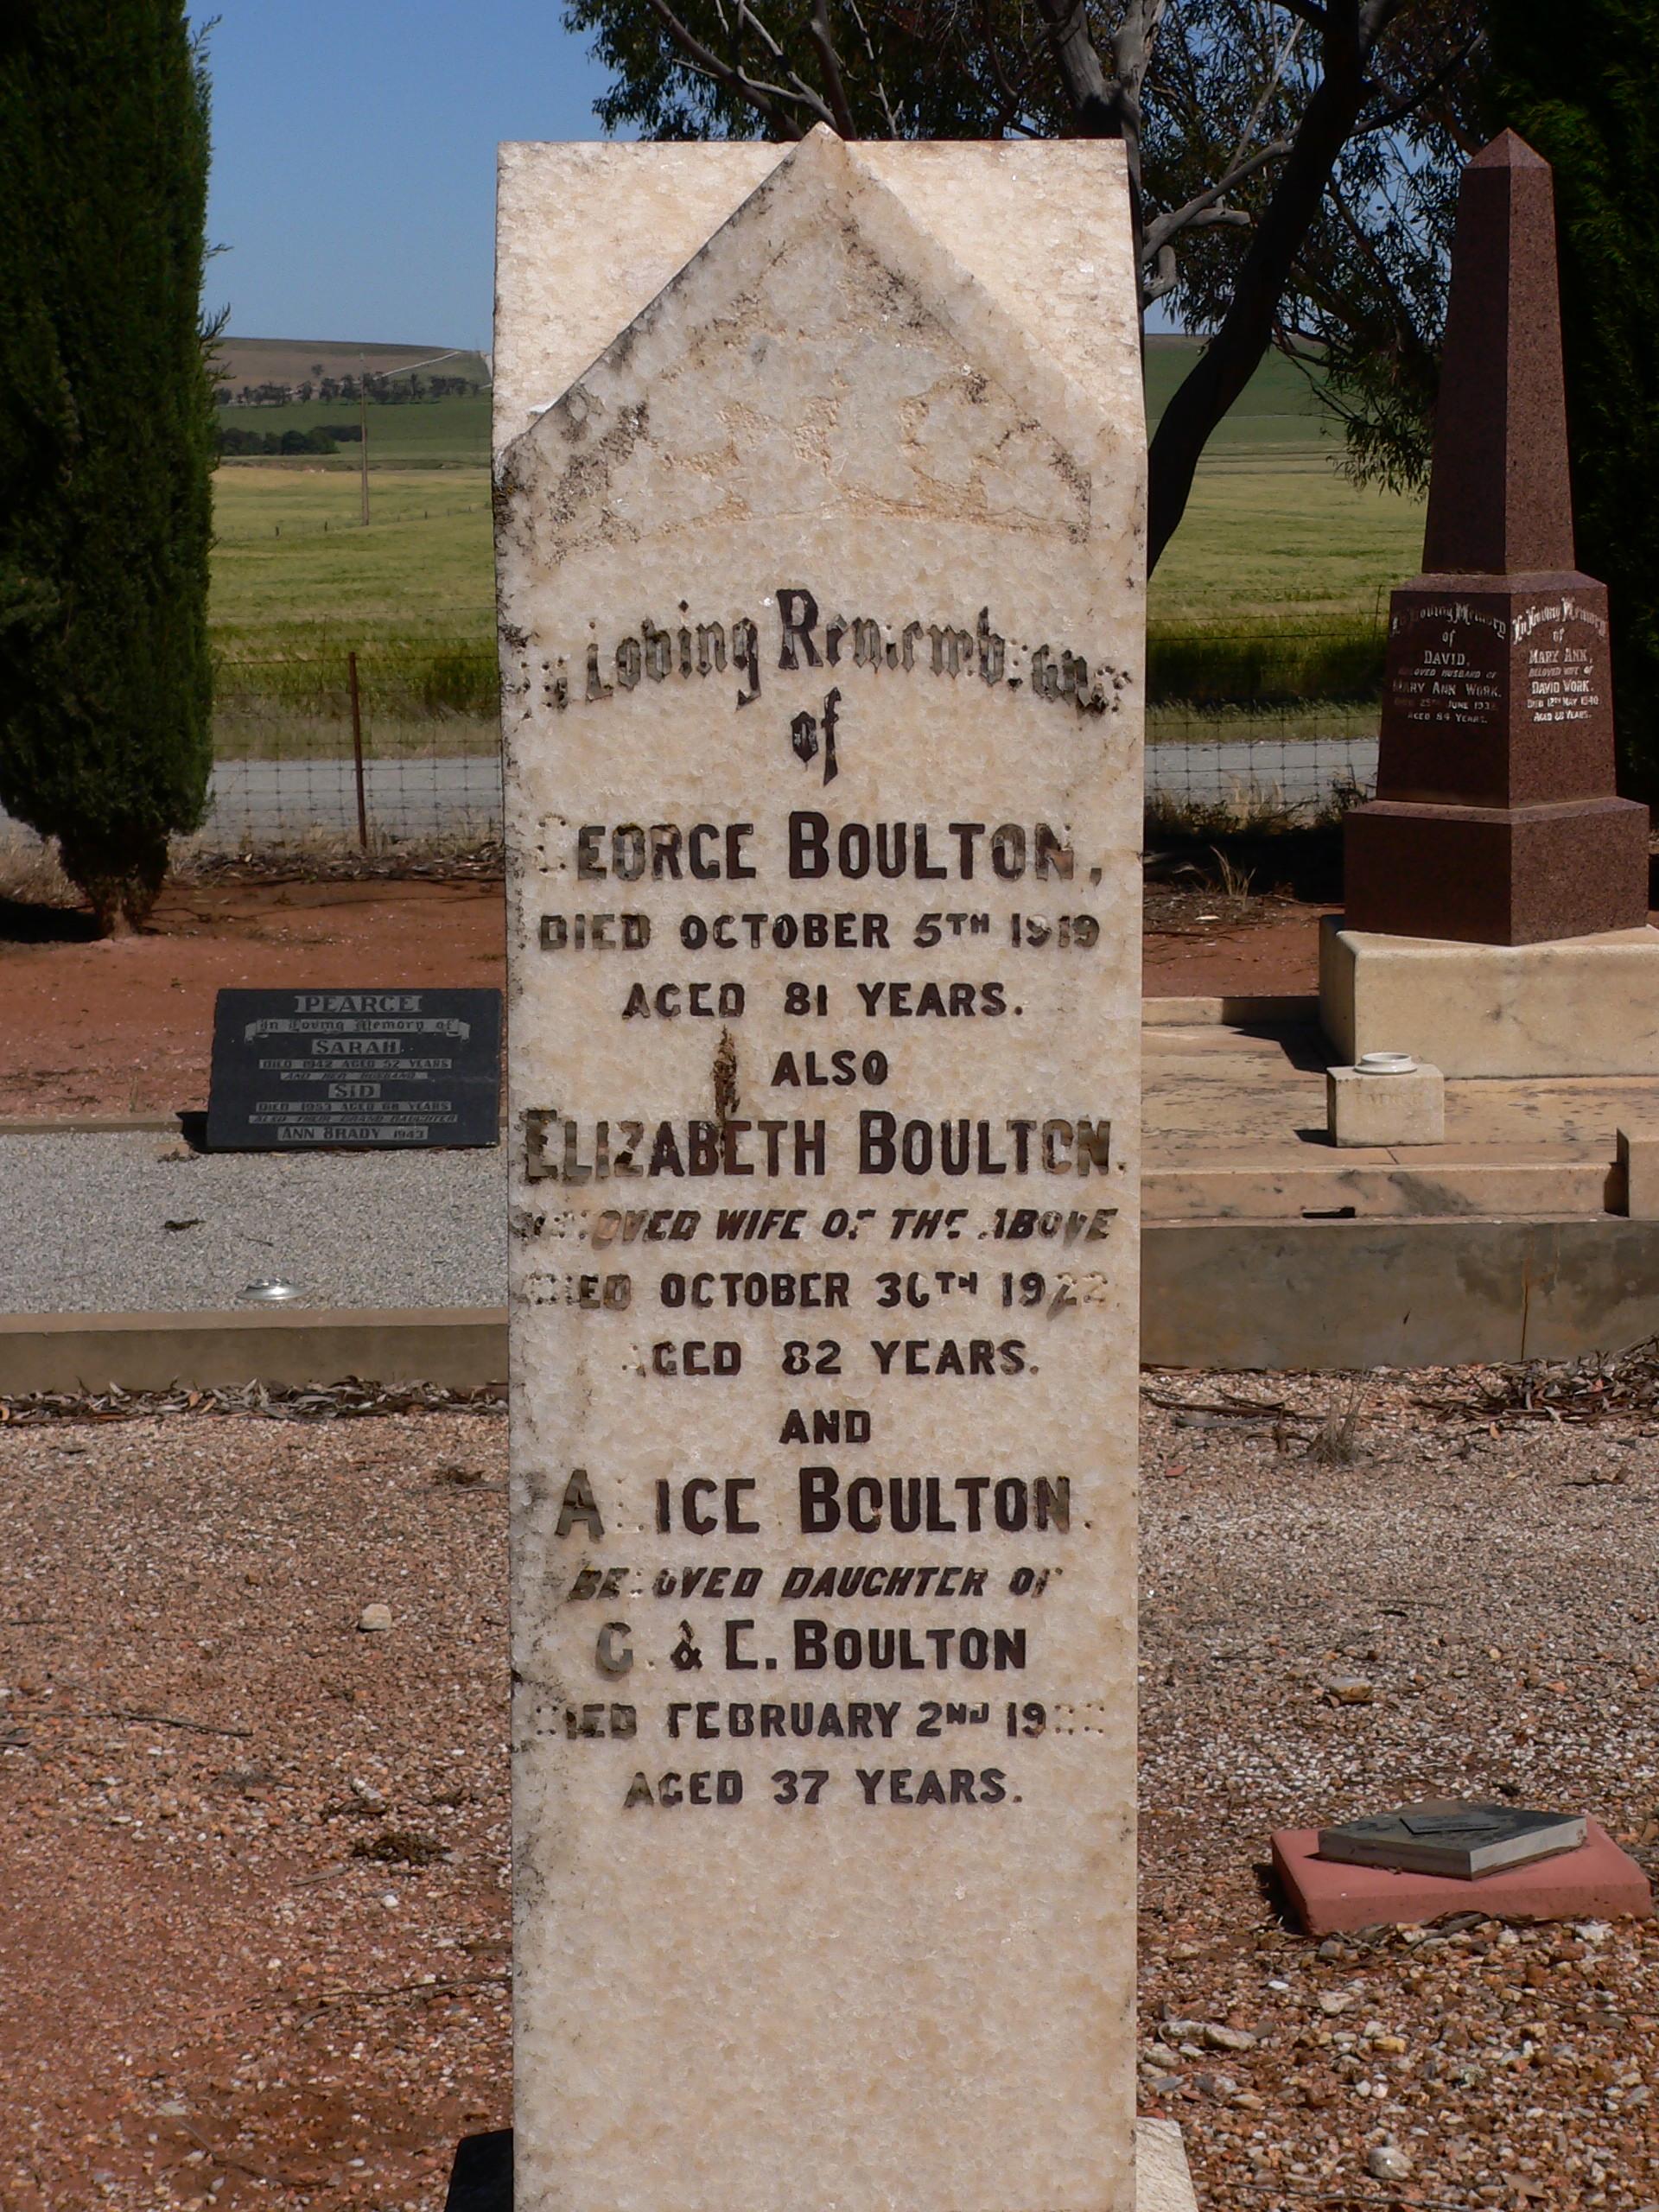 Kergia Elizabeth Boulton